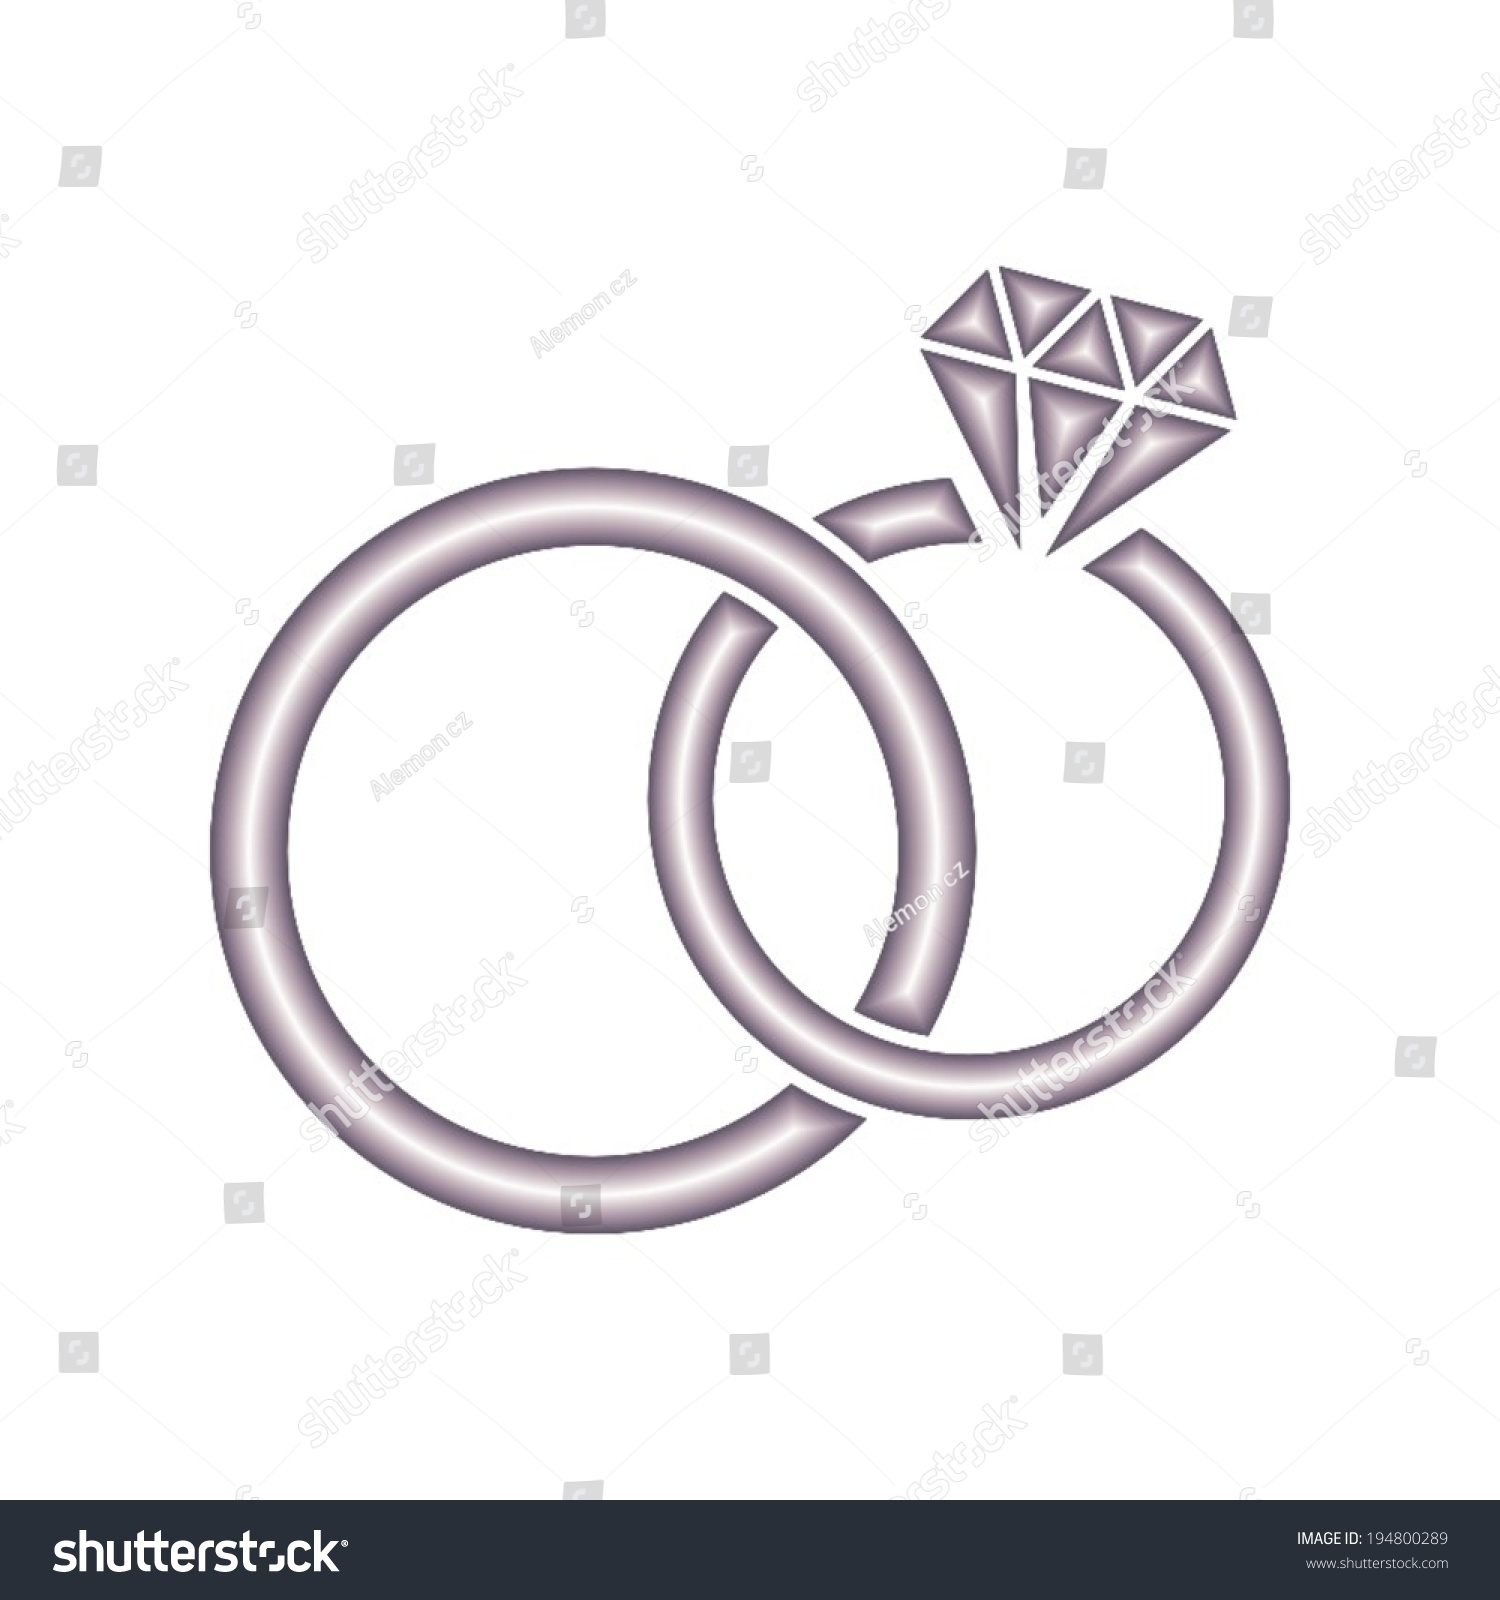 Wedding rings symbol  Vector Wedding Rings Icon On White Stock Vector 194800289 ...